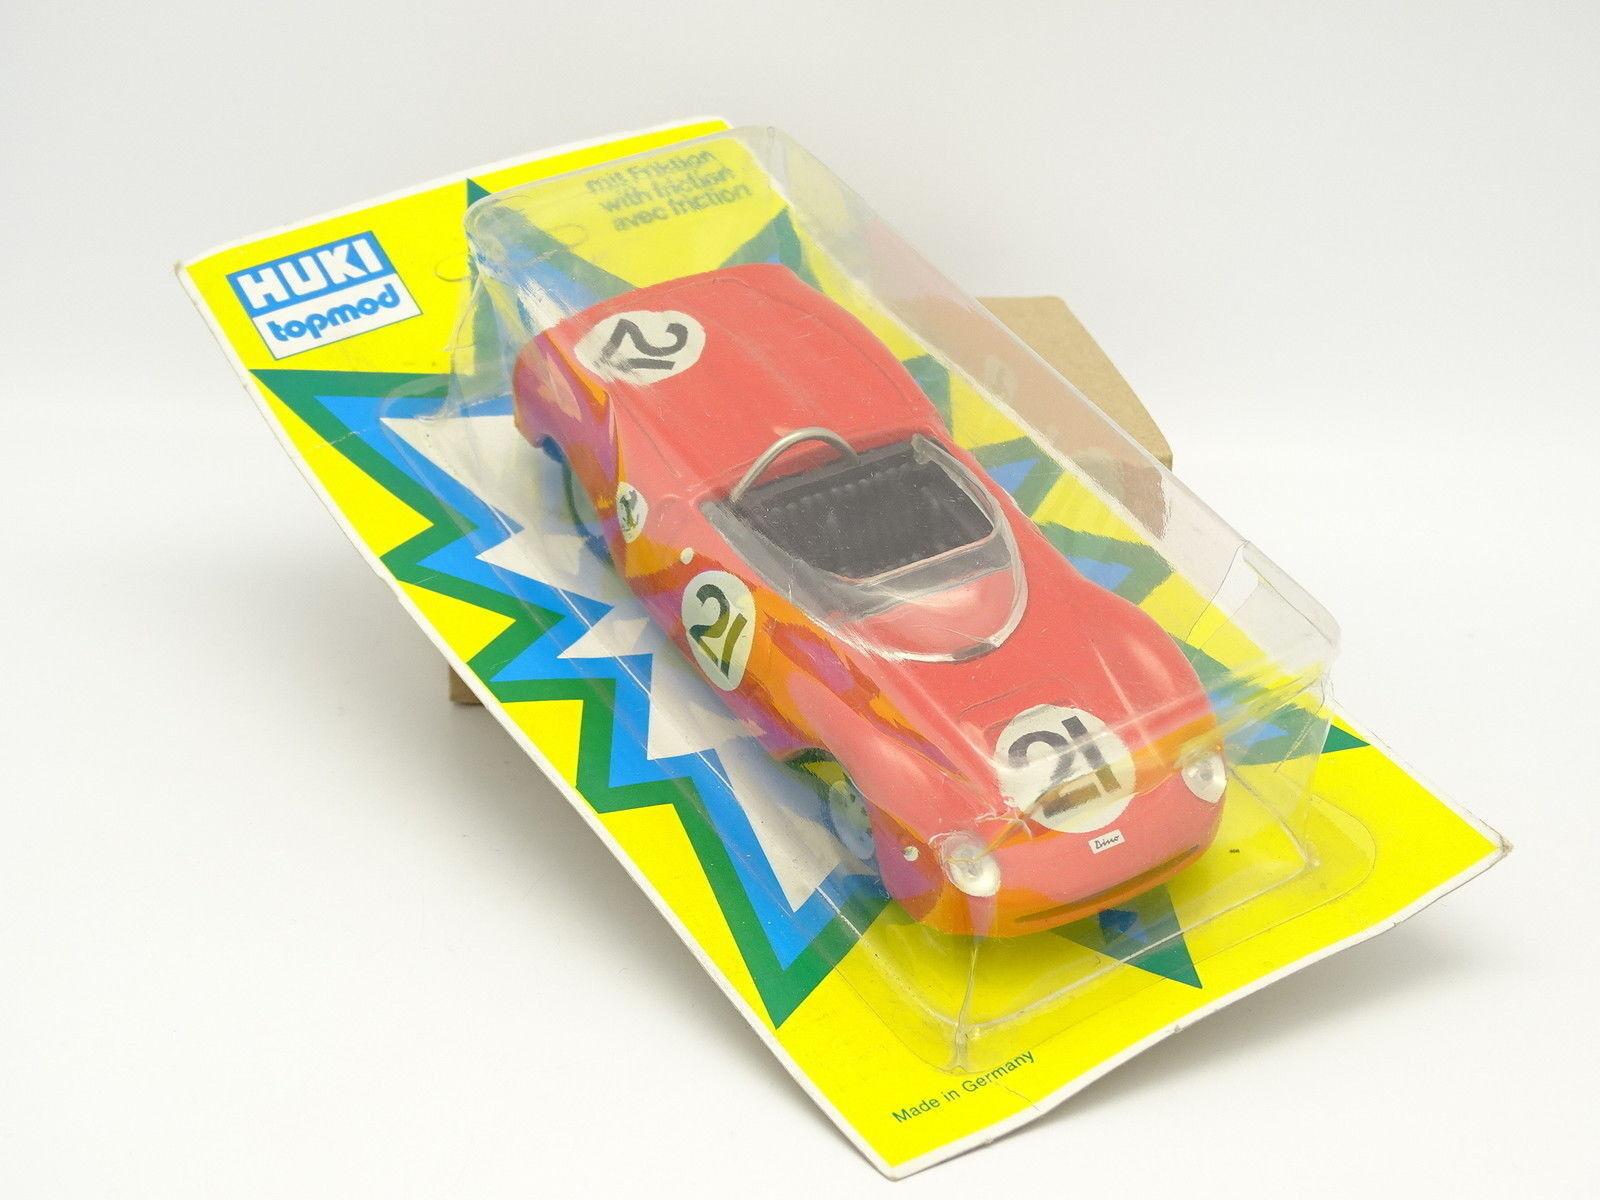 Huki Topmod Germany 1 1 1 40 - Ferrari Dino Spyder N°201 221806